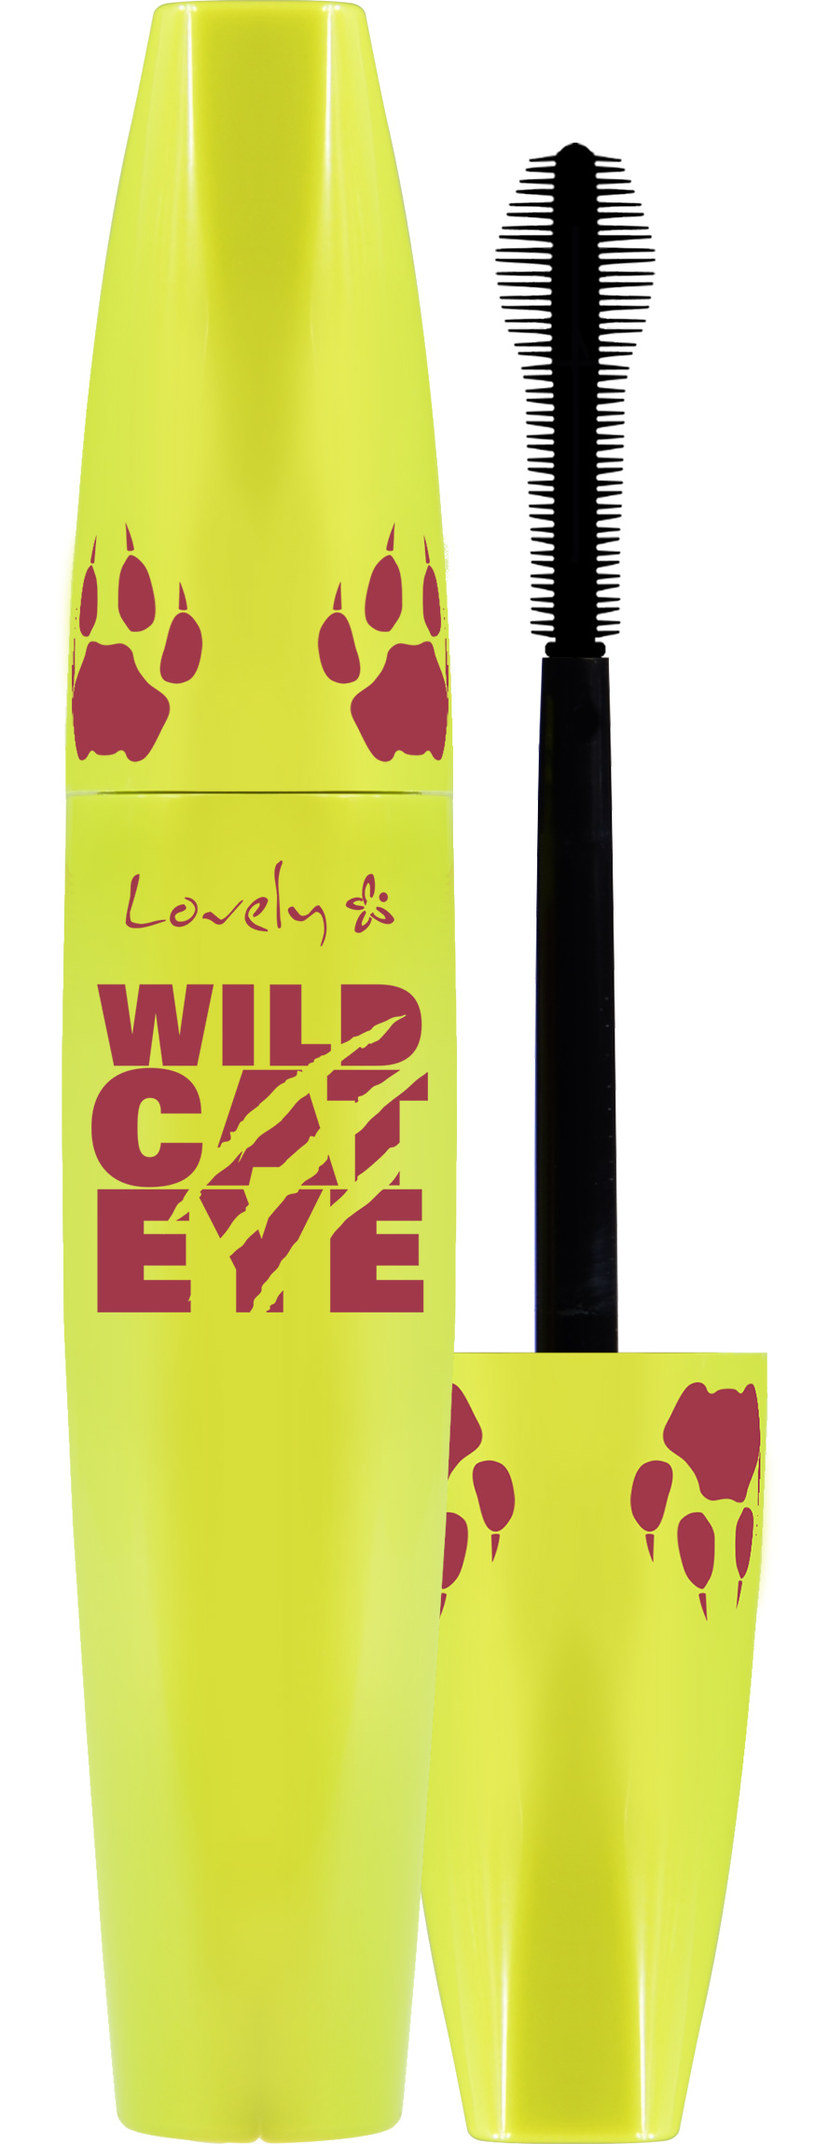 Maskara Wild Eye Cat Lovely /materiały prasowe